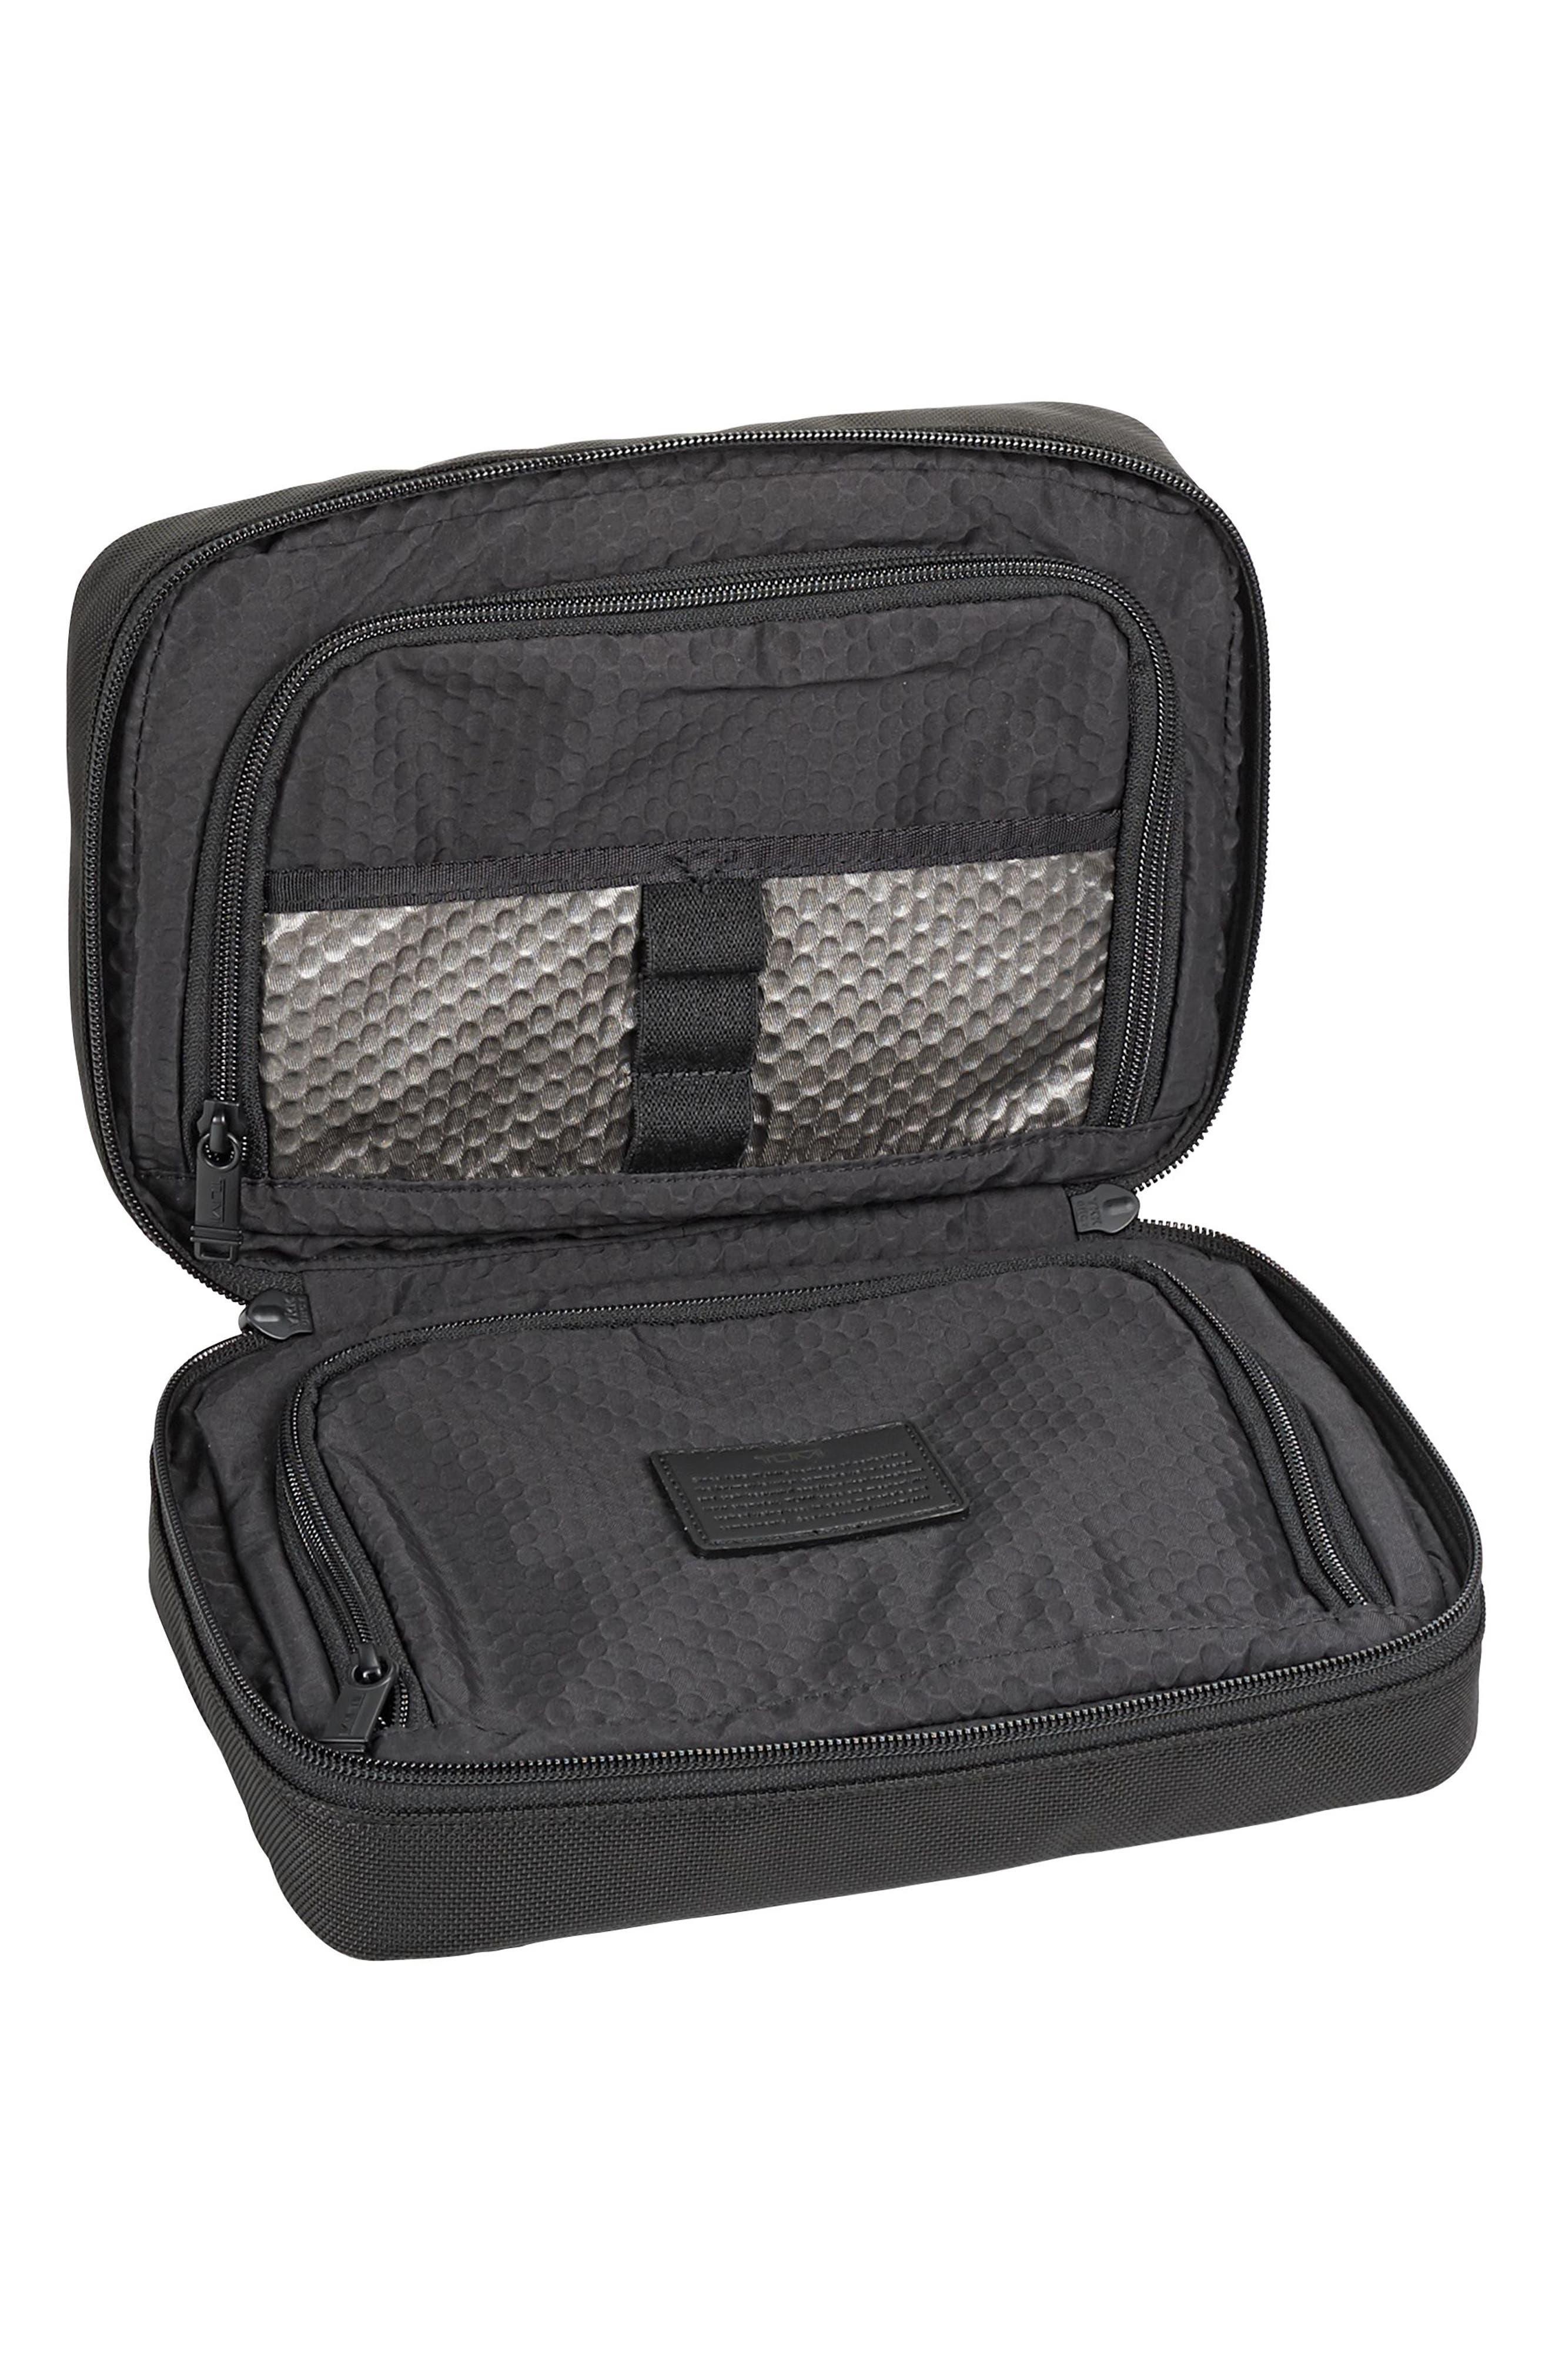 2ed1225e02e4 Men s Tumi Travel Kits